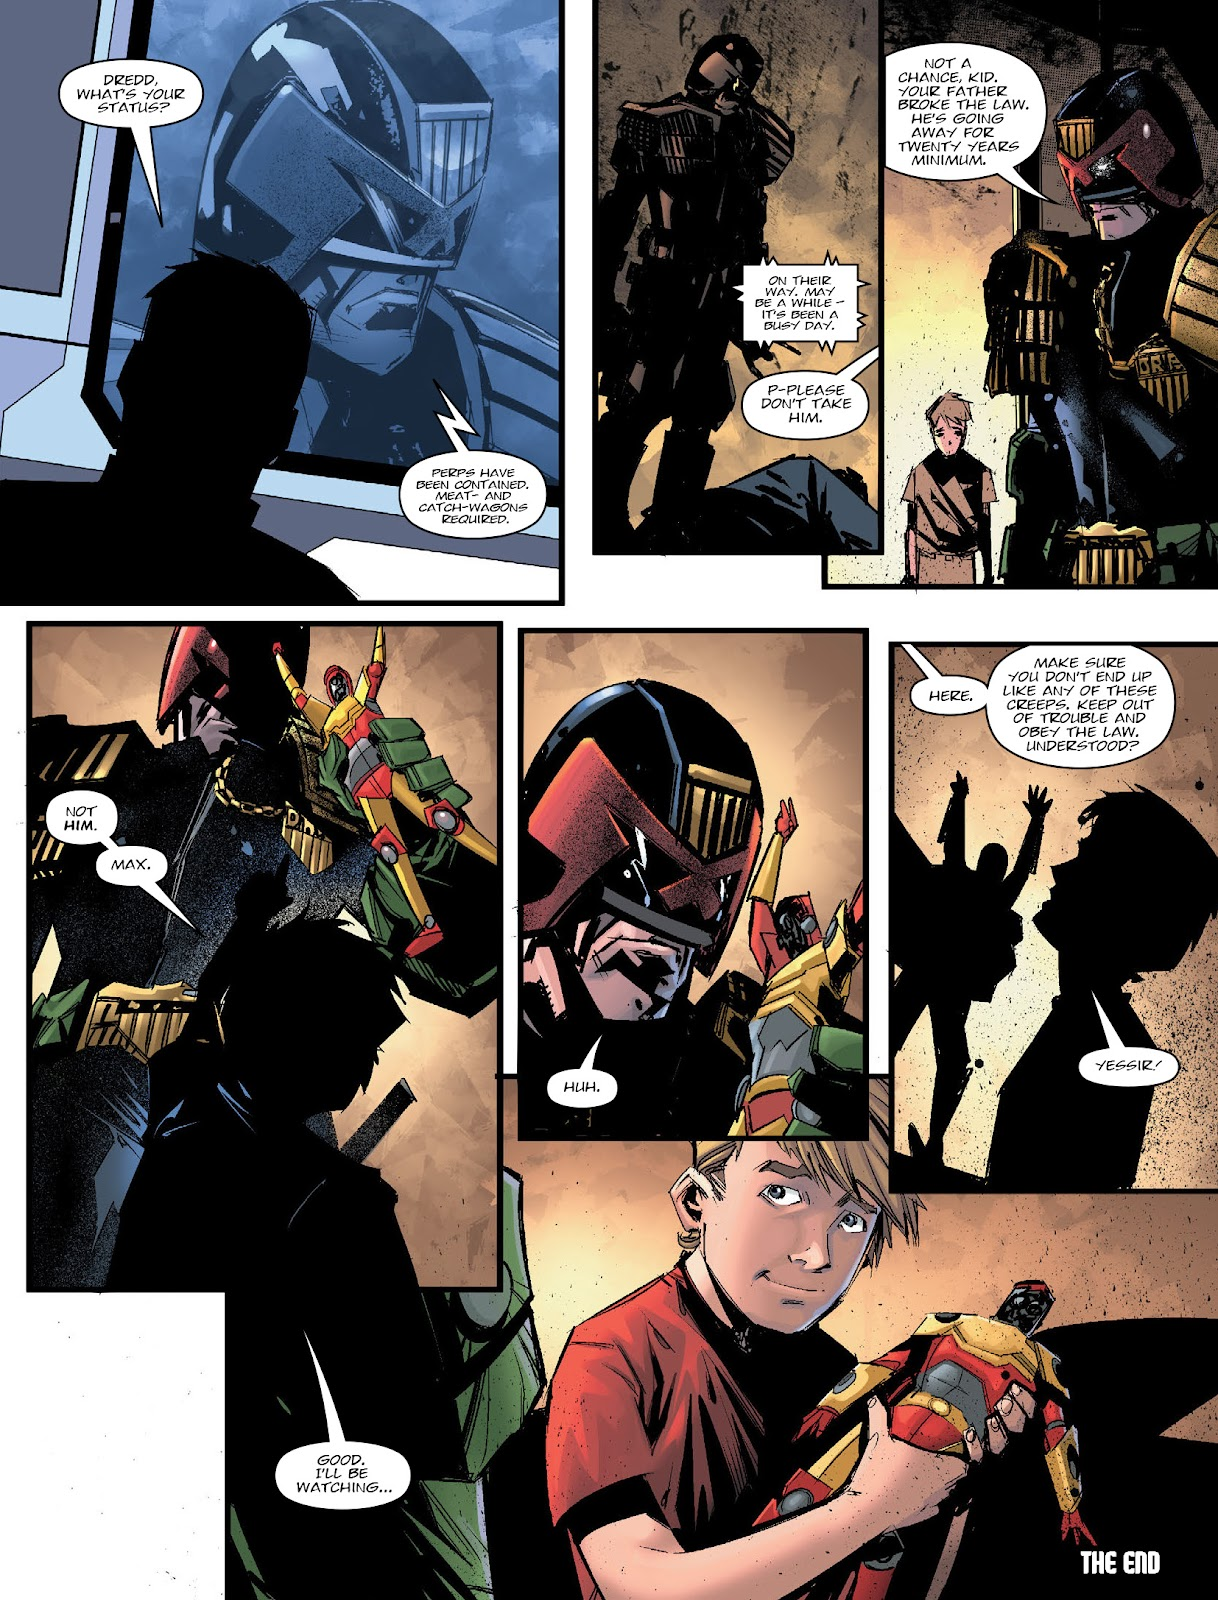 Judge Dredd Megazine (Vol. 5) issue 427 - Page 14